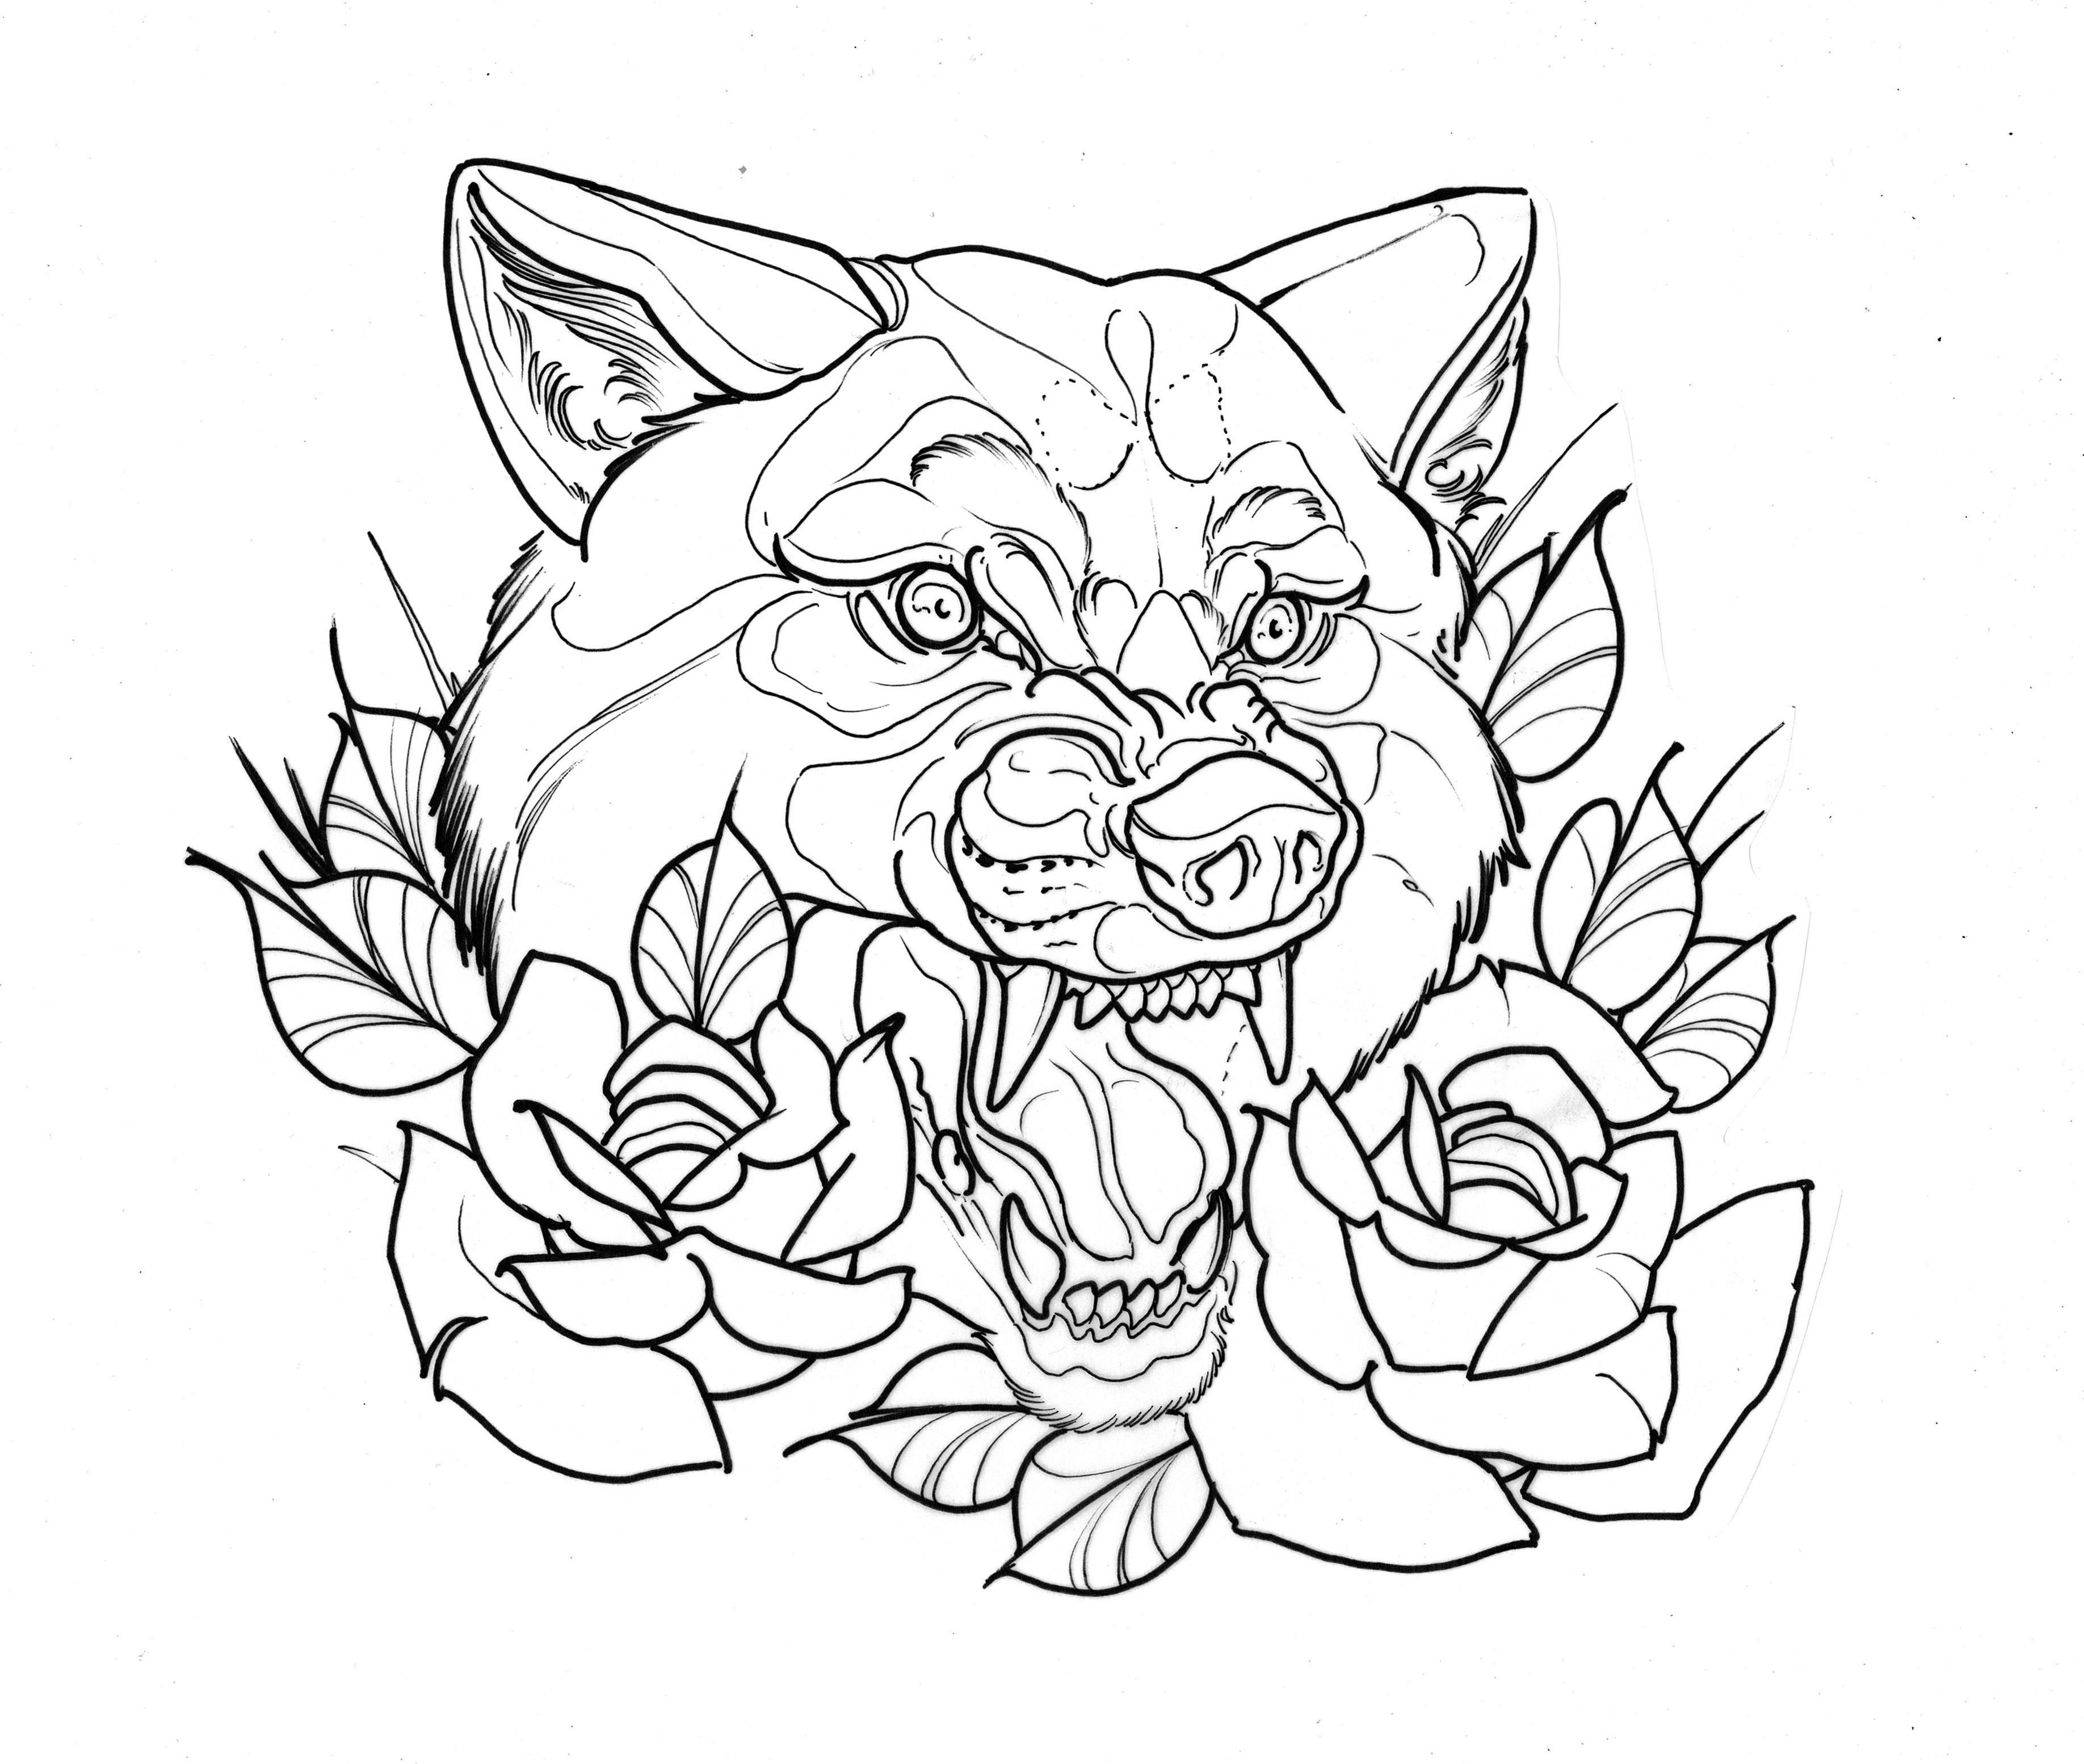 Wolf Head Tattoo With Flowers Rose Sketch Design Wolf Tattoo Traditional Wolf Girl Tattoos Head Tattoos